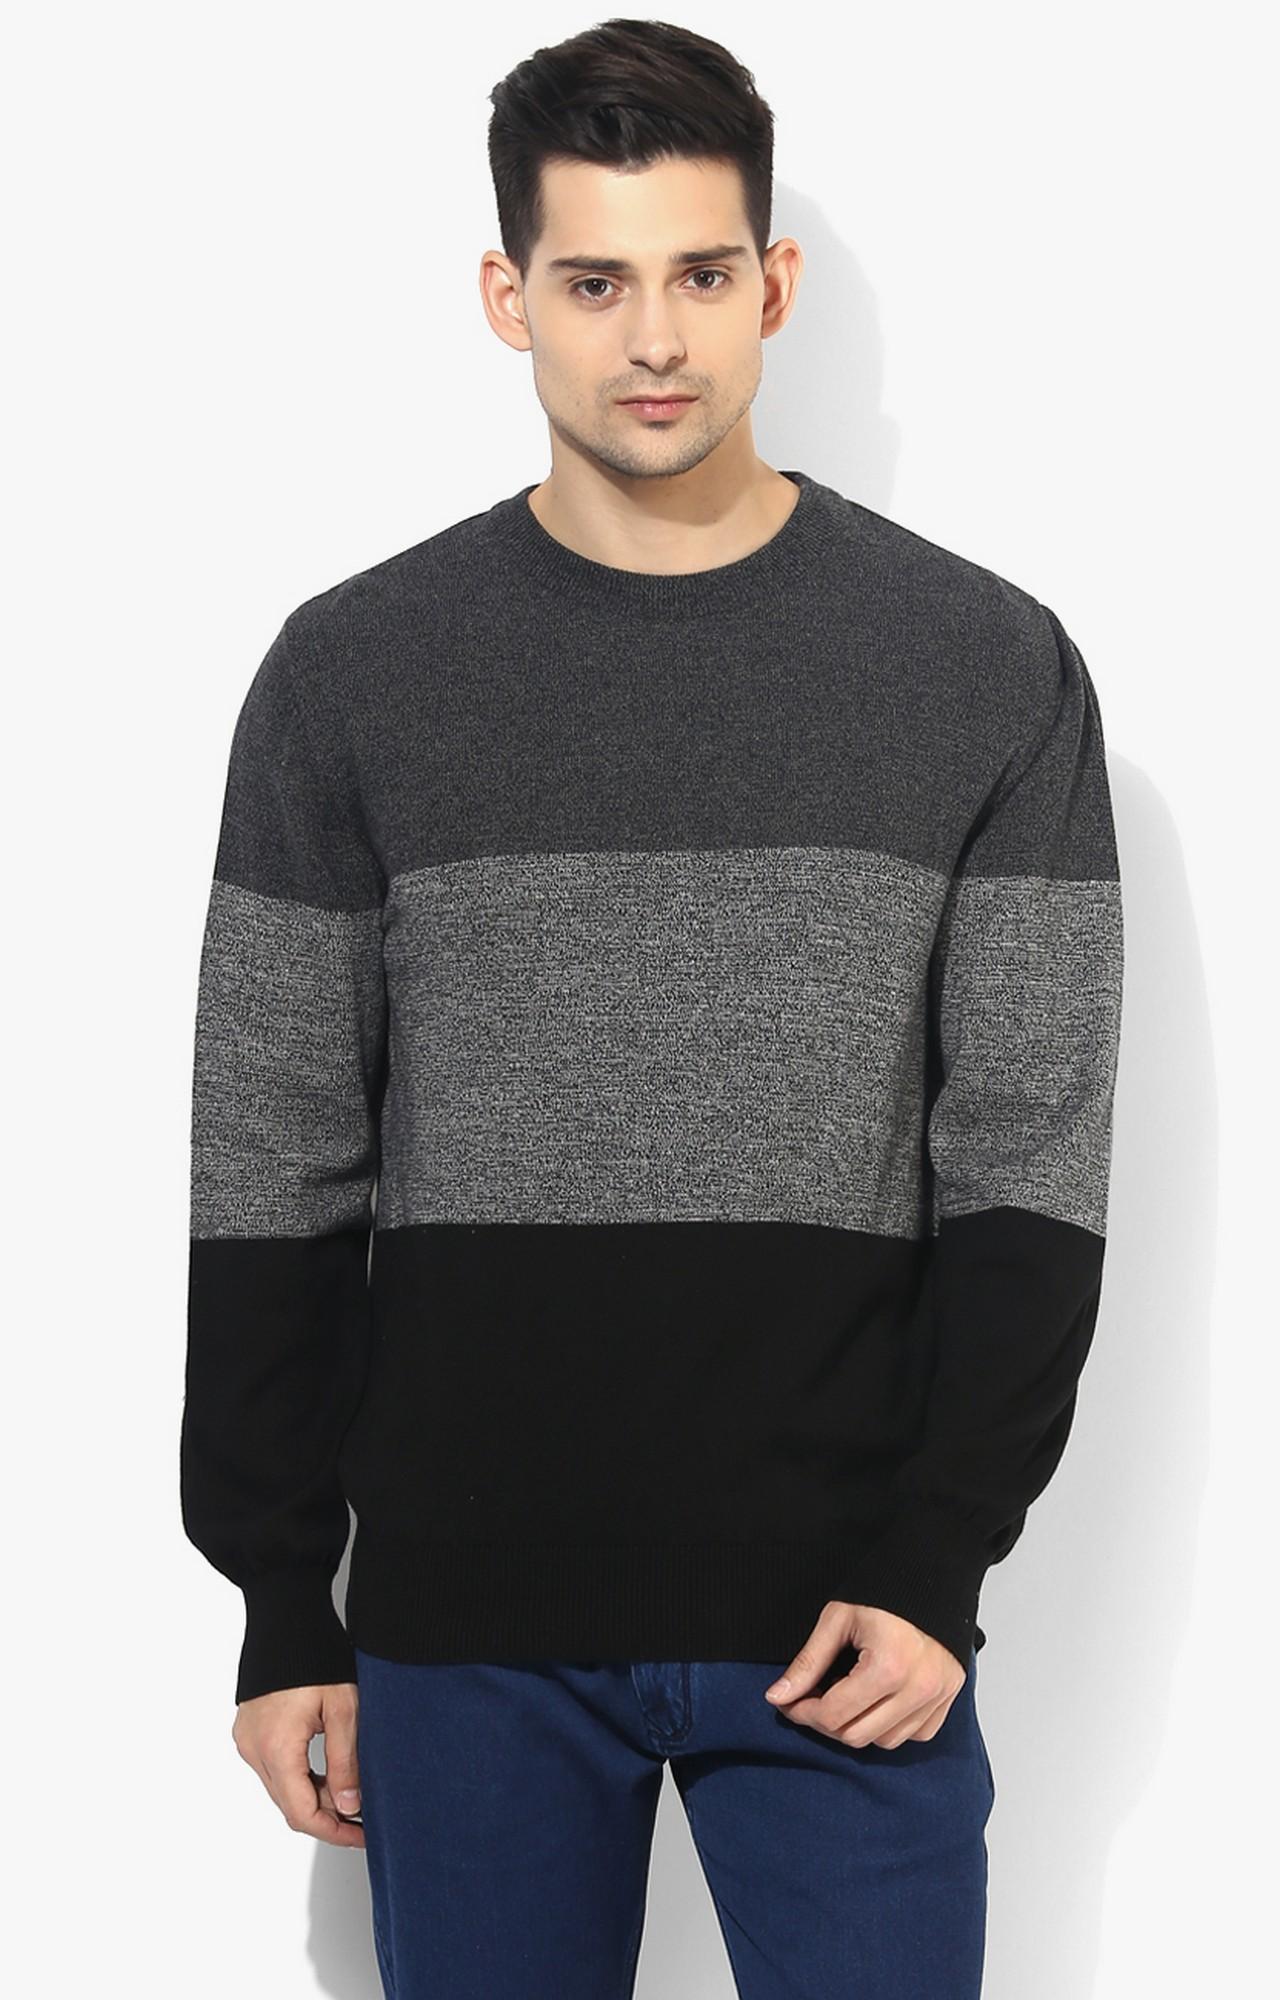 RED CHIEF | Black & Grey Colourblock Sweater